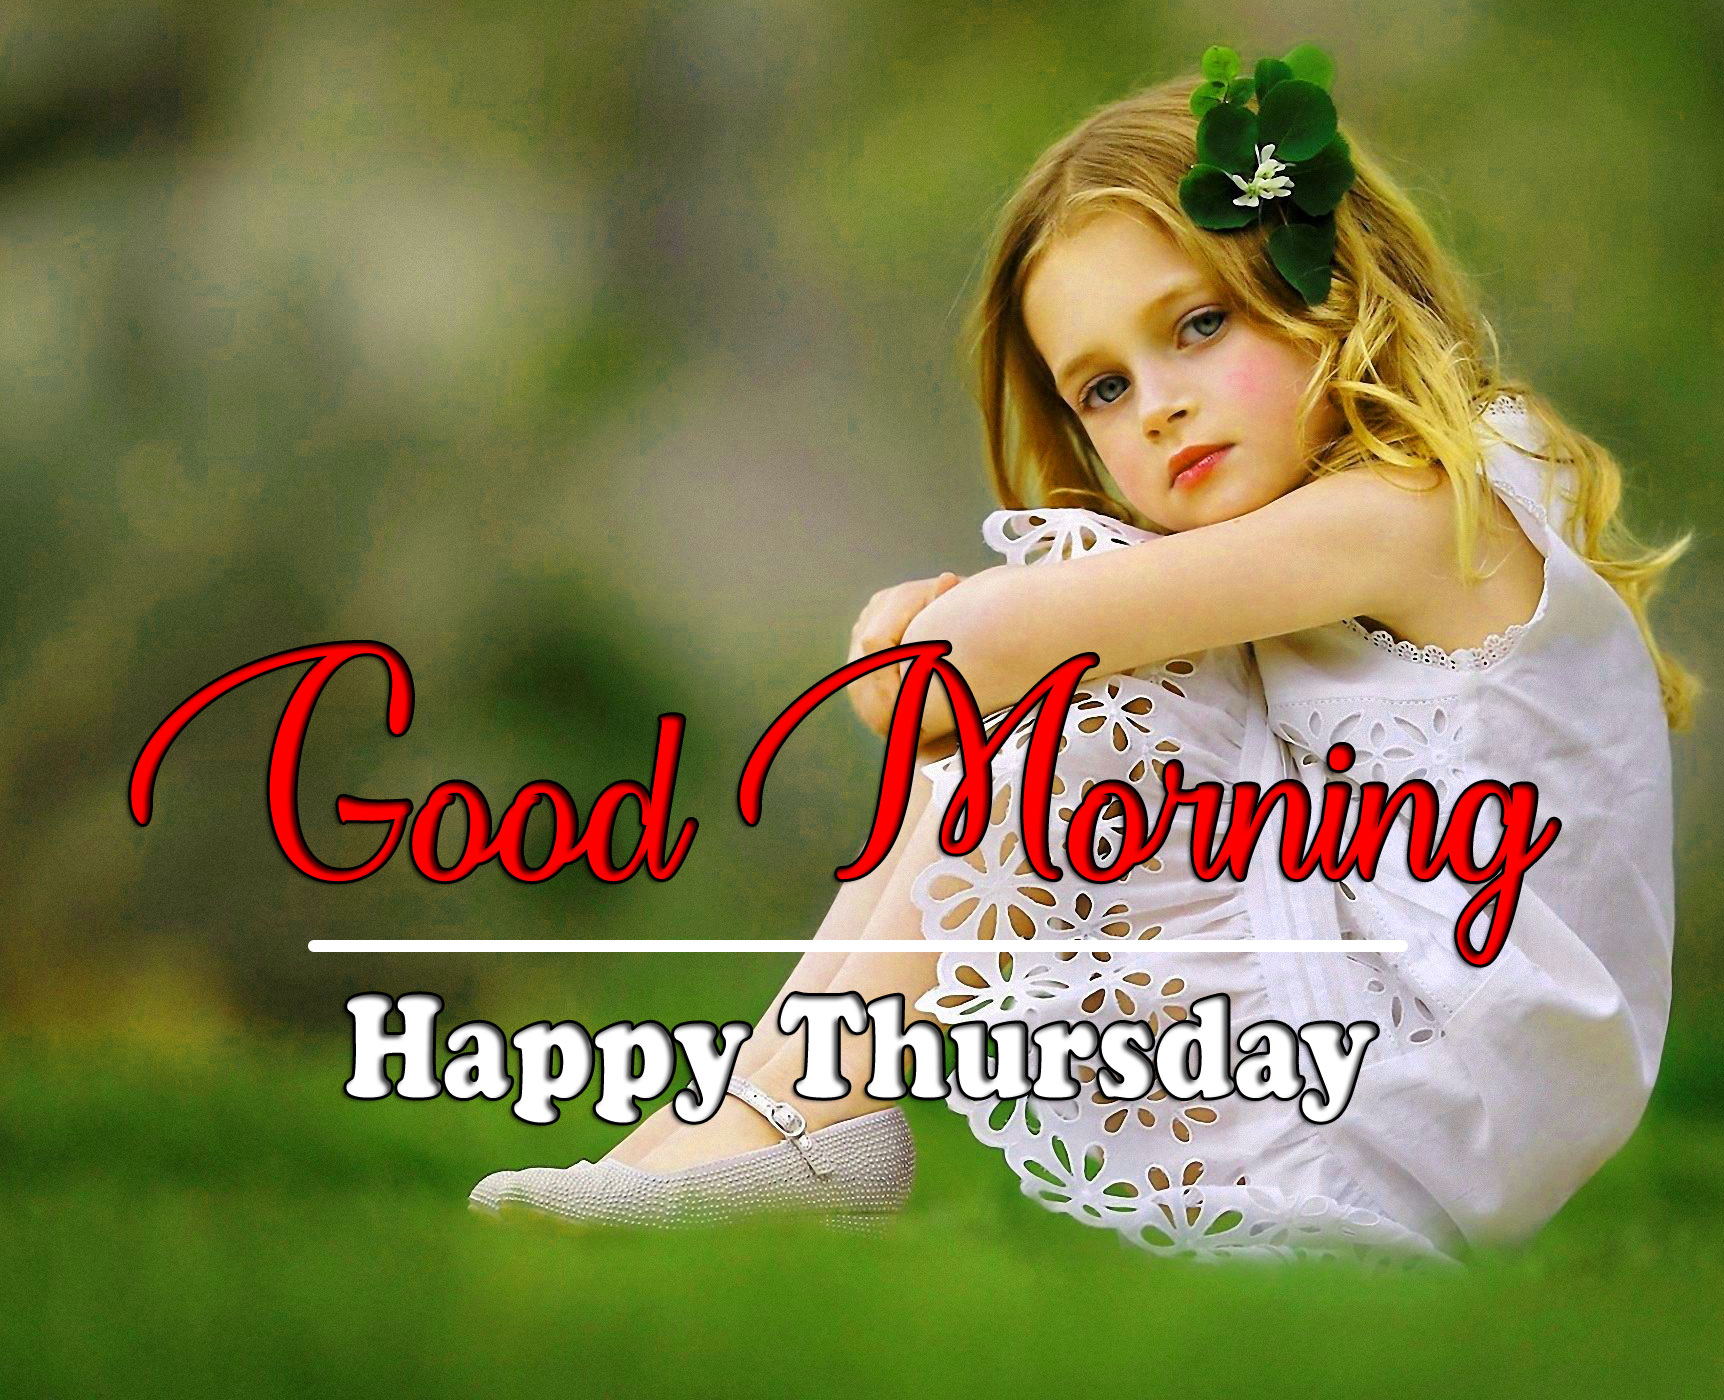 thursday morning Pics Download